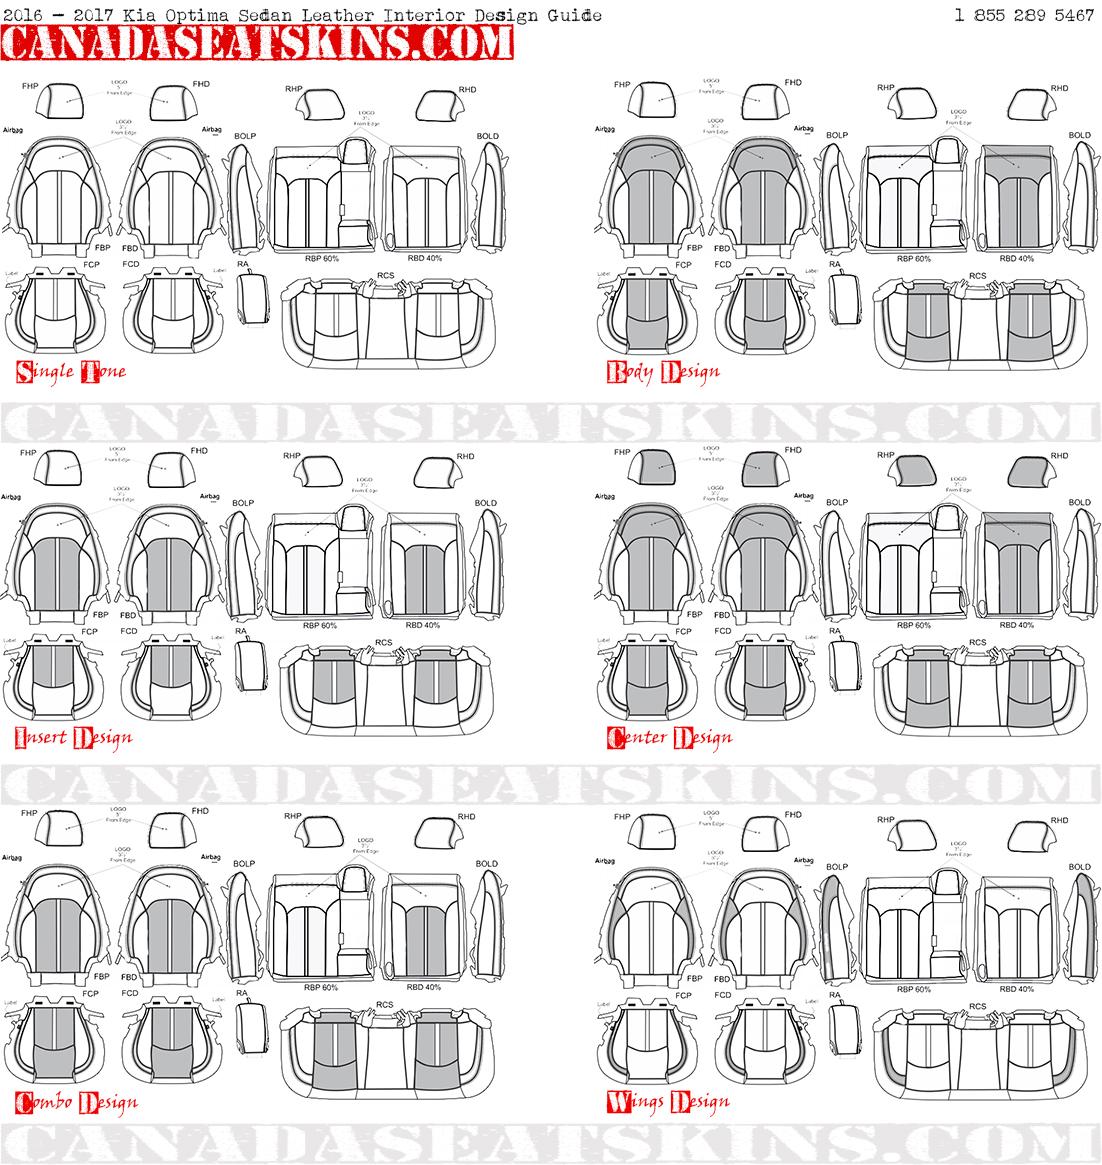 2016 Kia Optima Interior: 2019 Kia Optima Custom Leather Upholstery